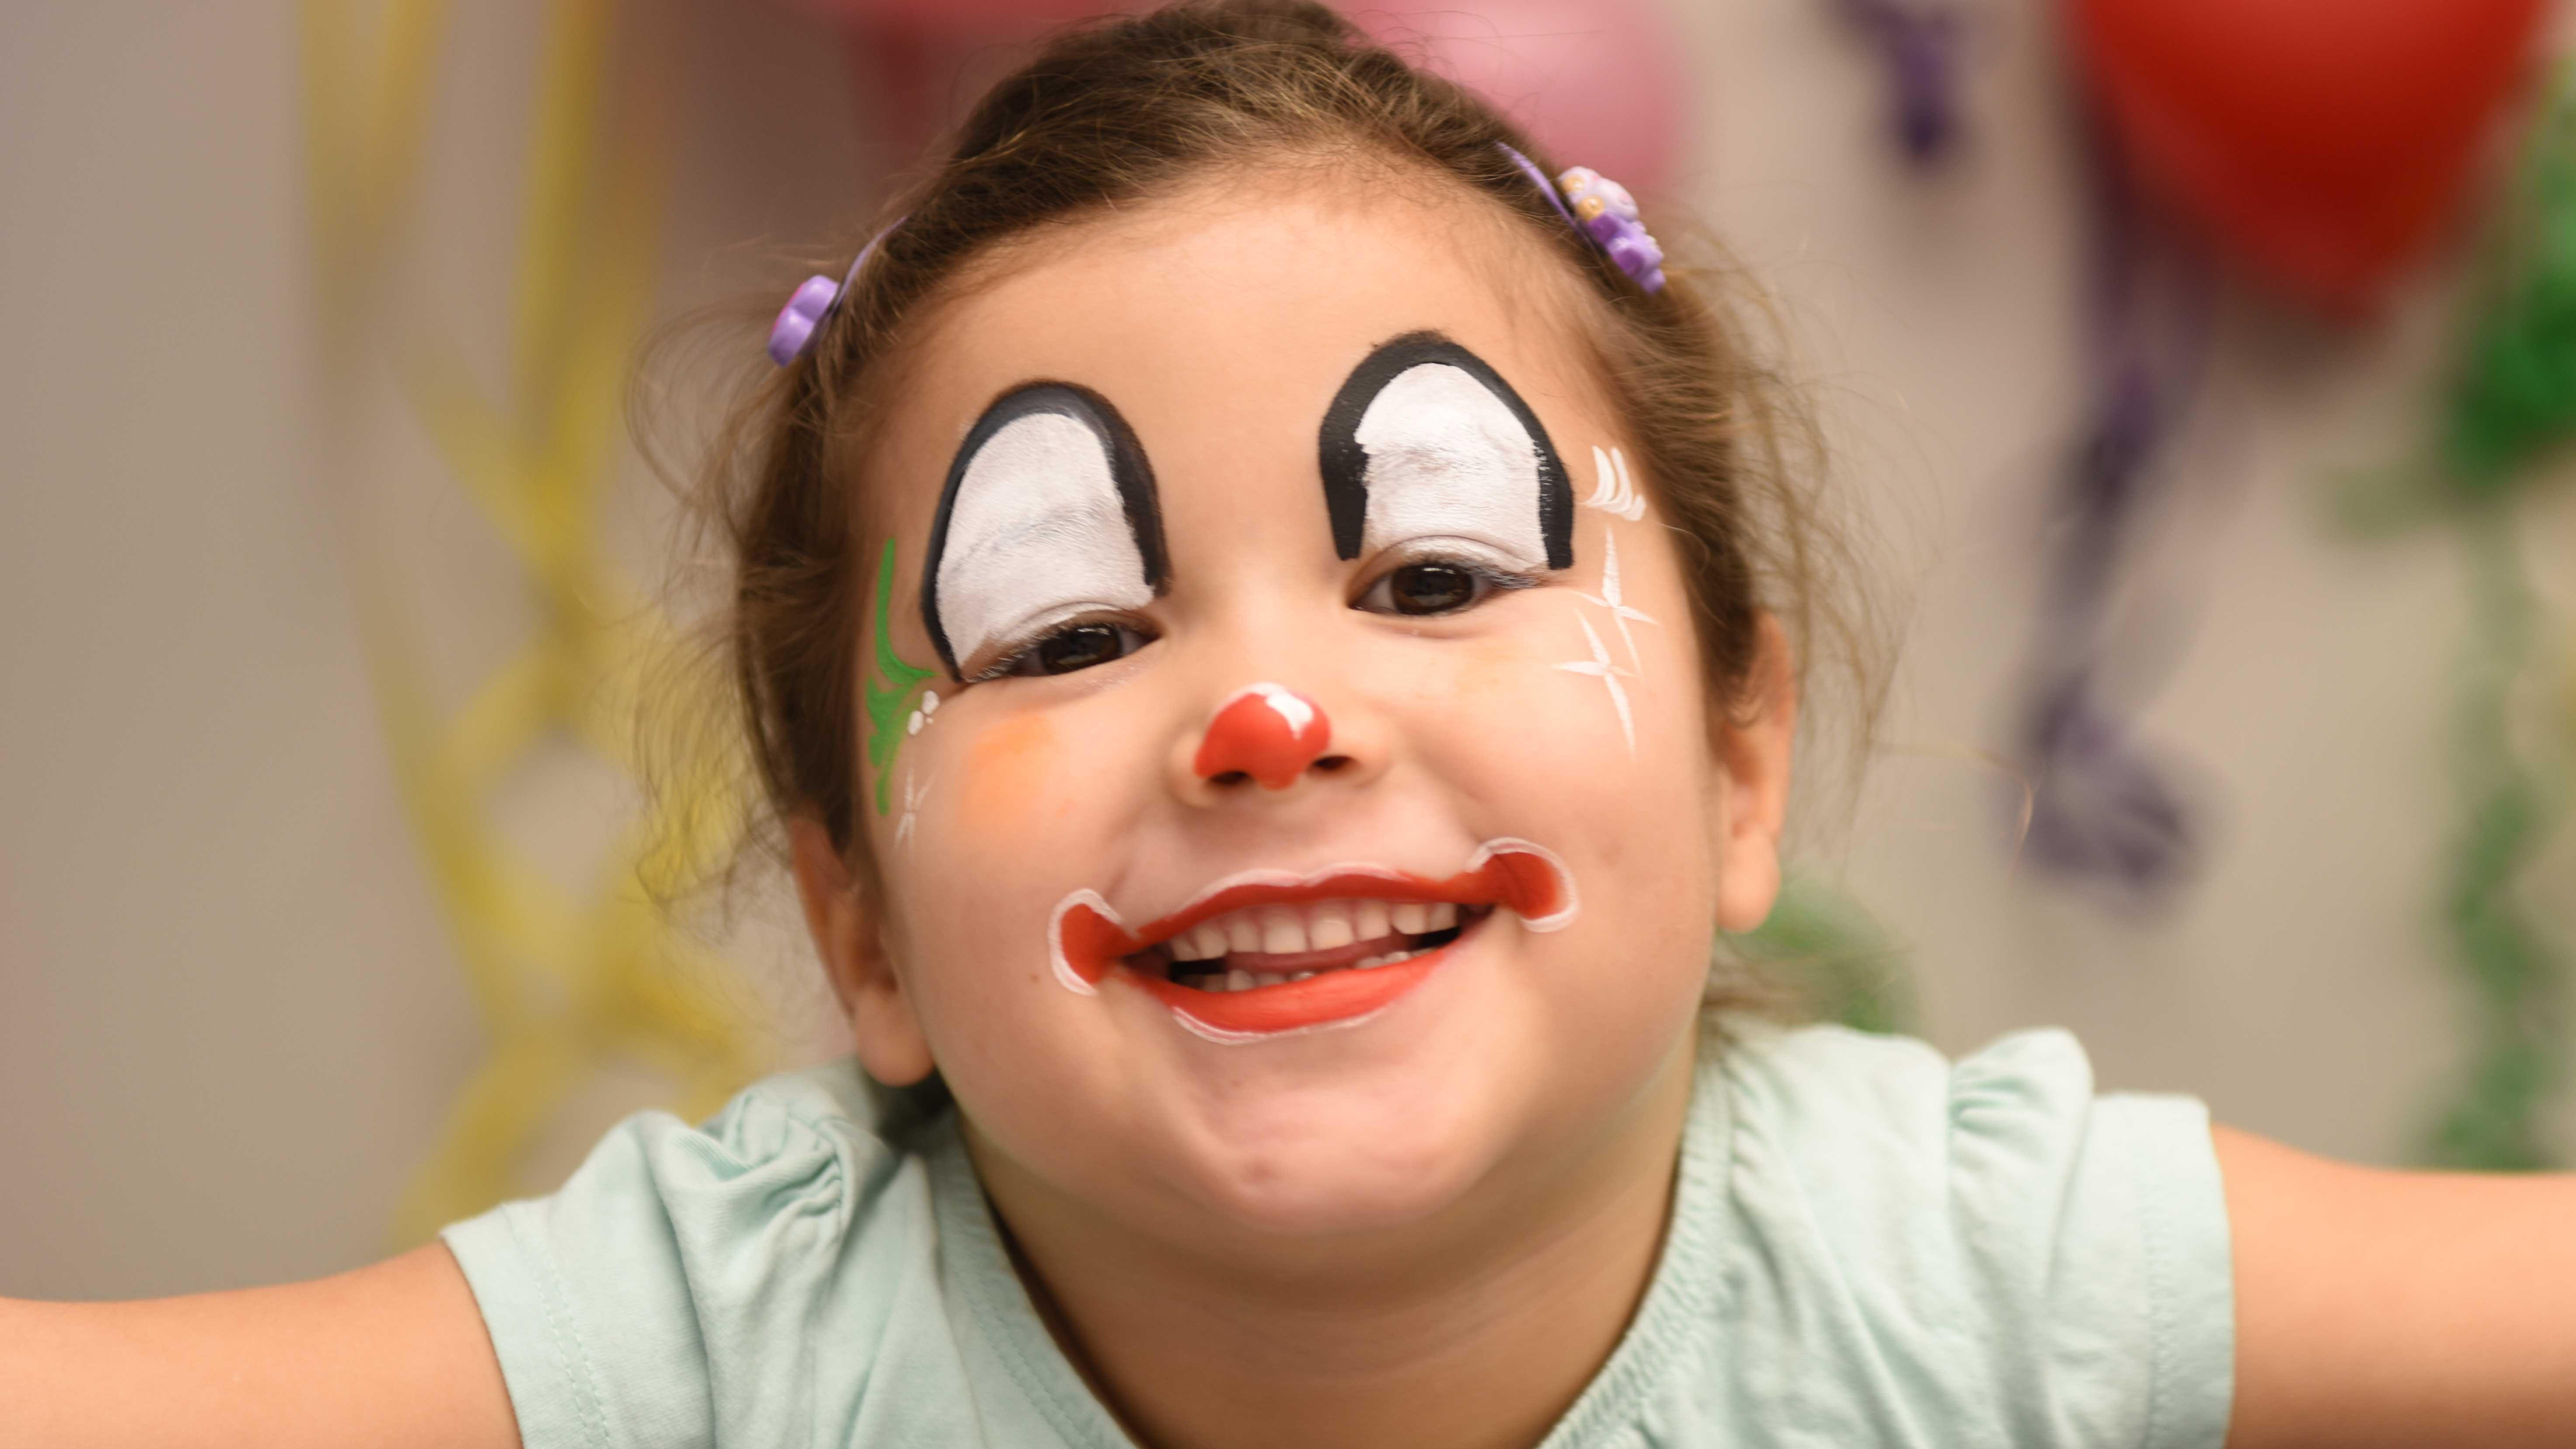 Kinderschminken Fur Fasnacht Mit Videoanleitung Famigros